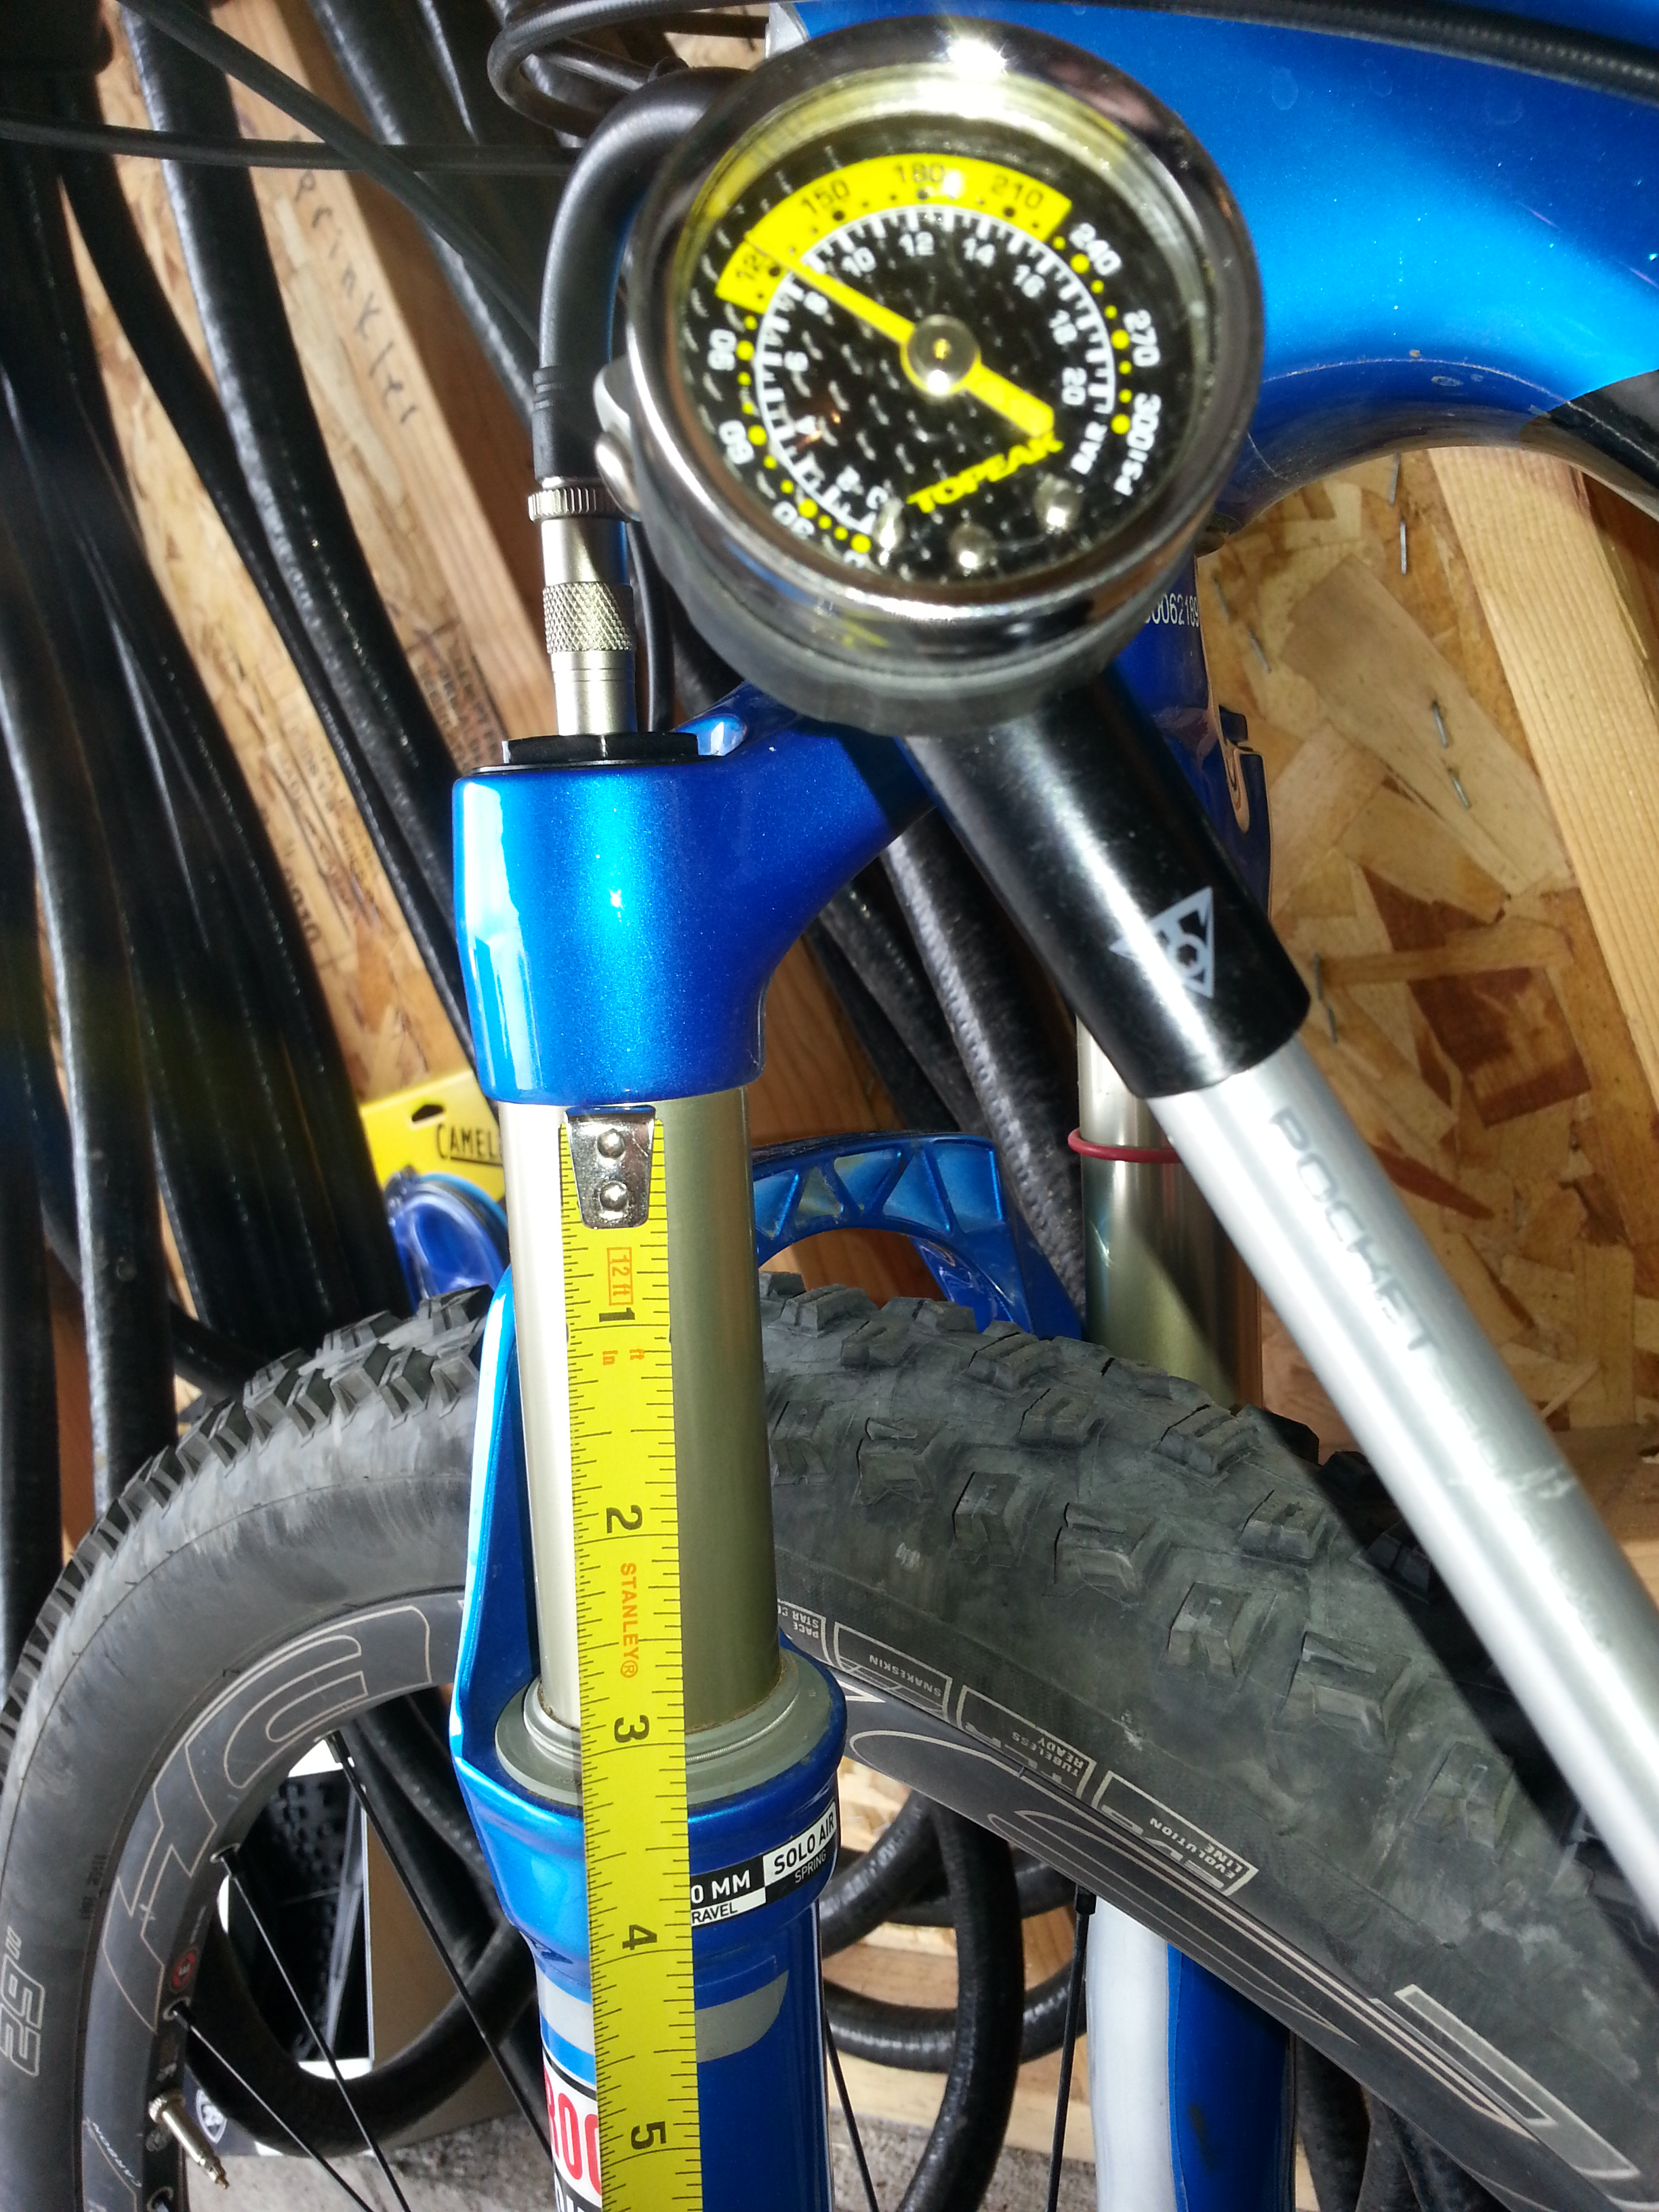 How To Basic Bike Maintenance For Beginners Singletracks Mountain